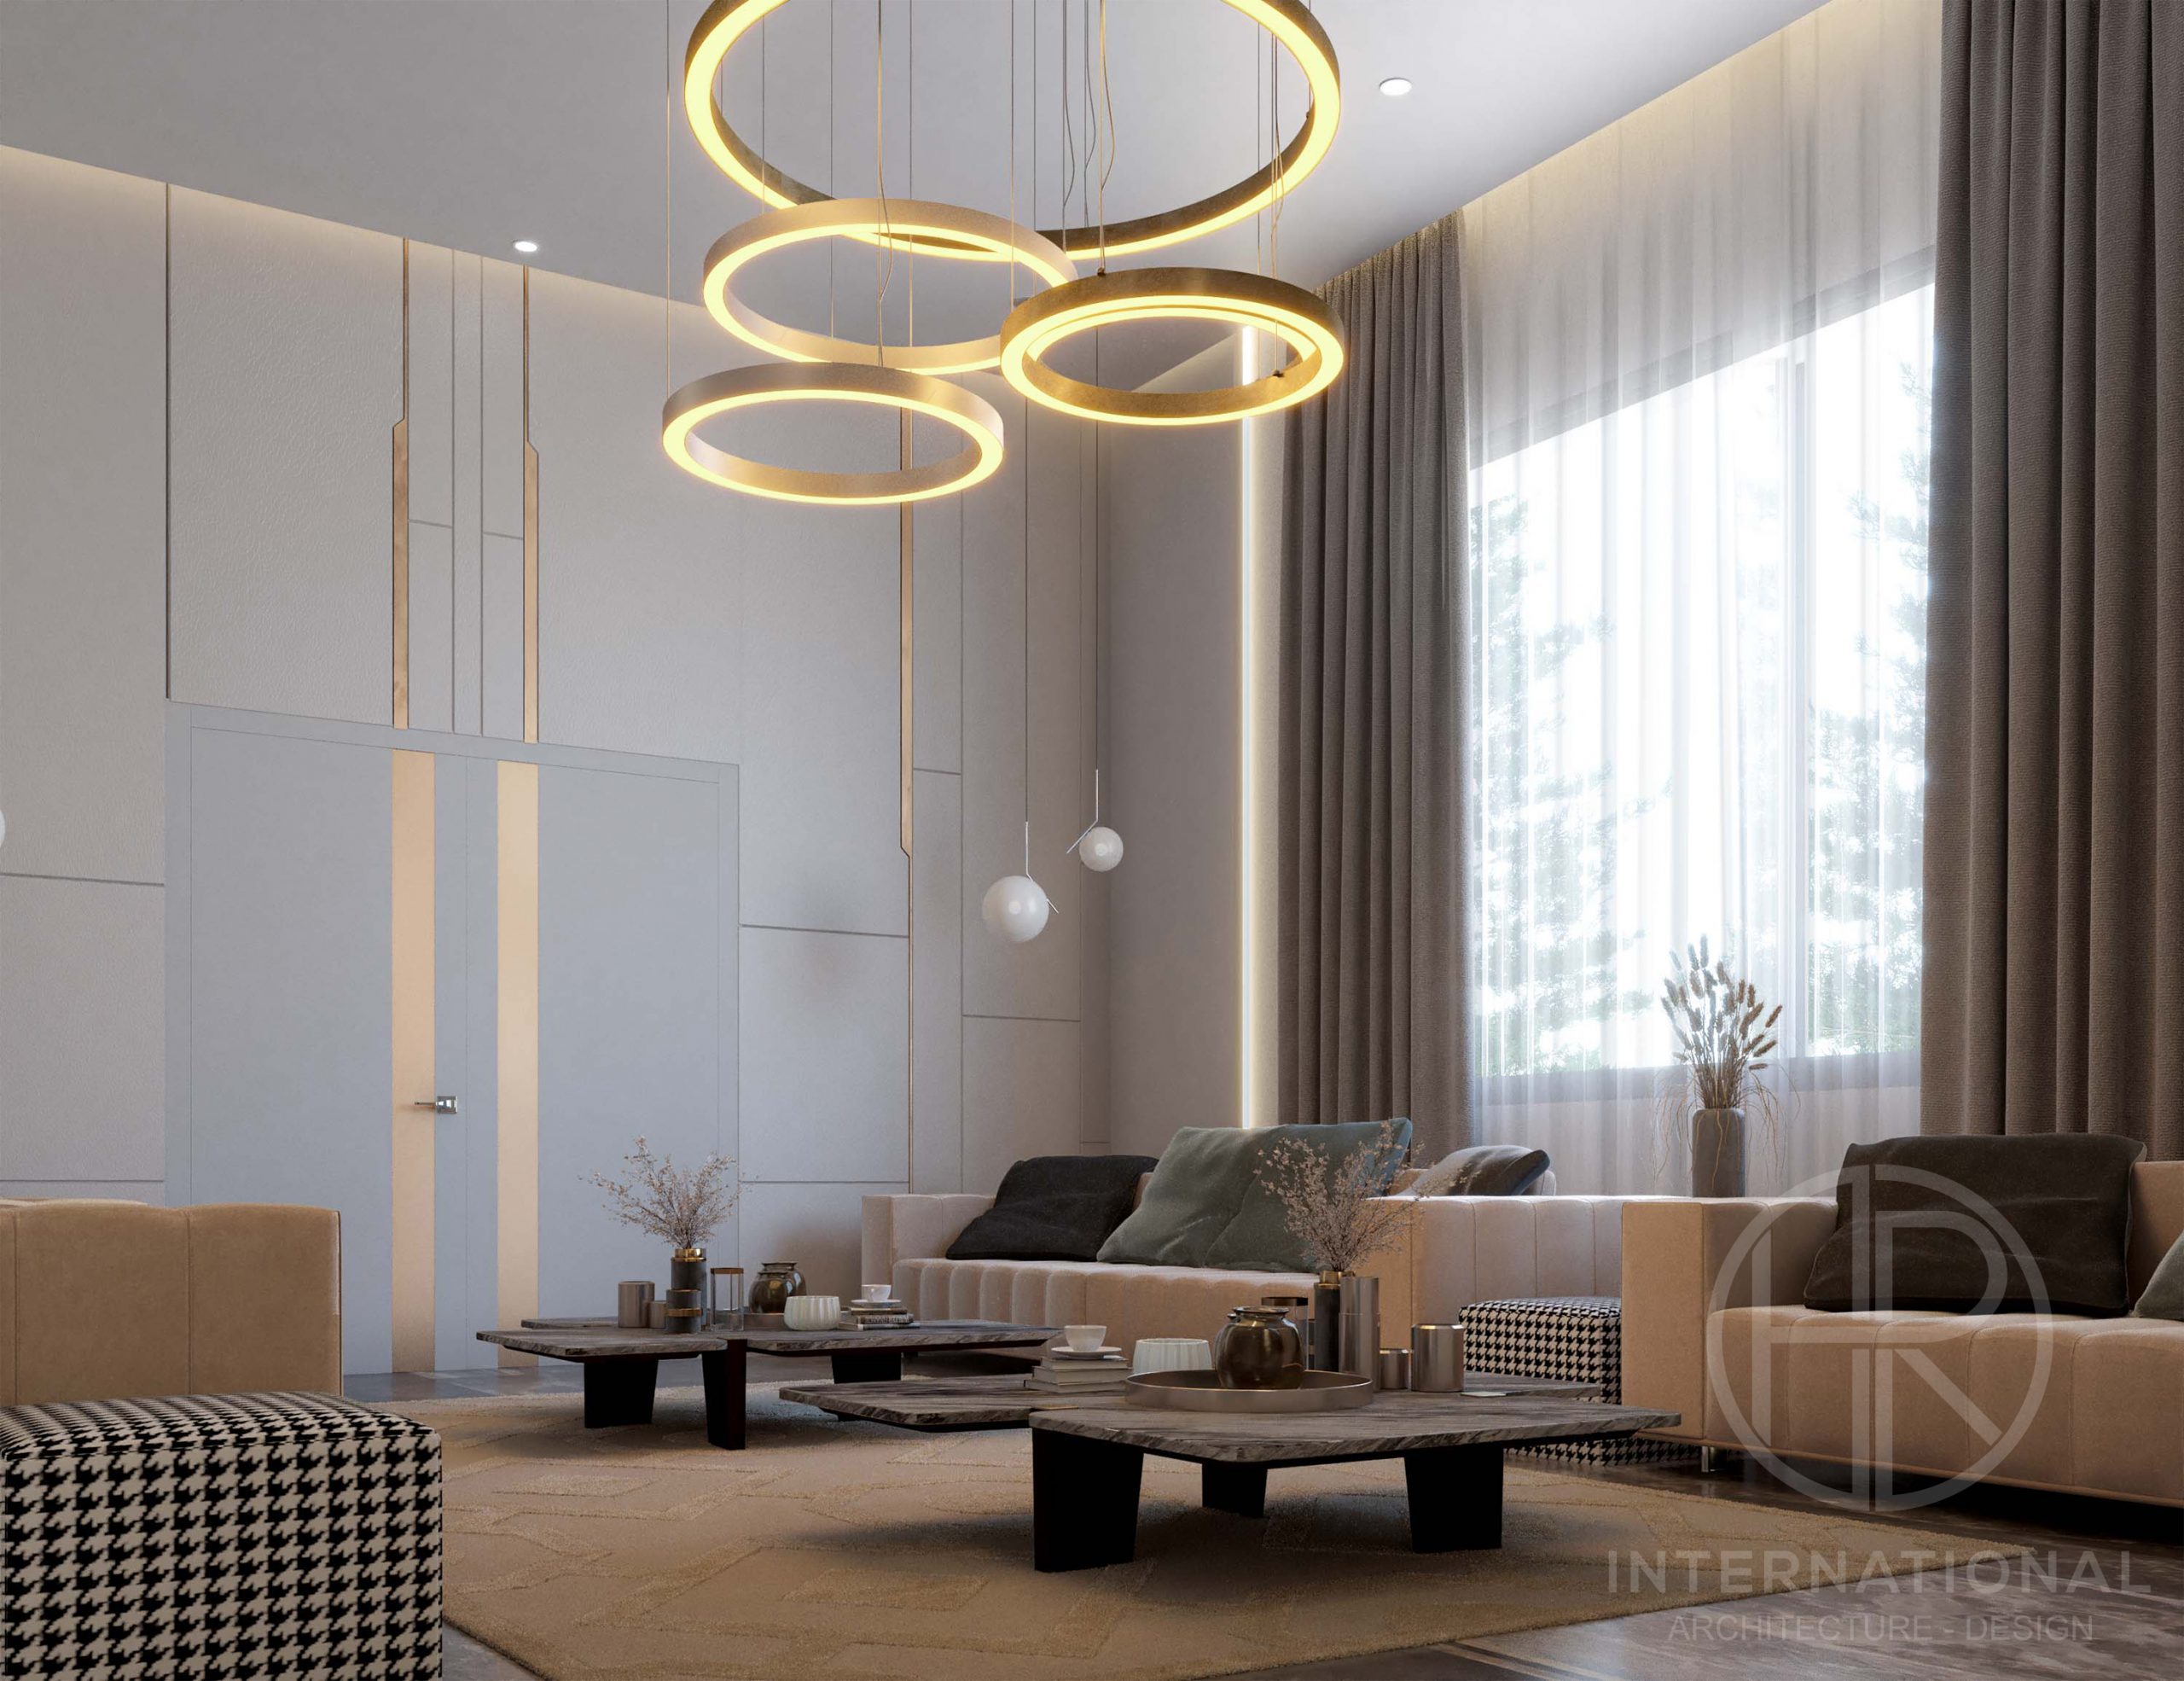 soft colors - soft mood - gold - modern design